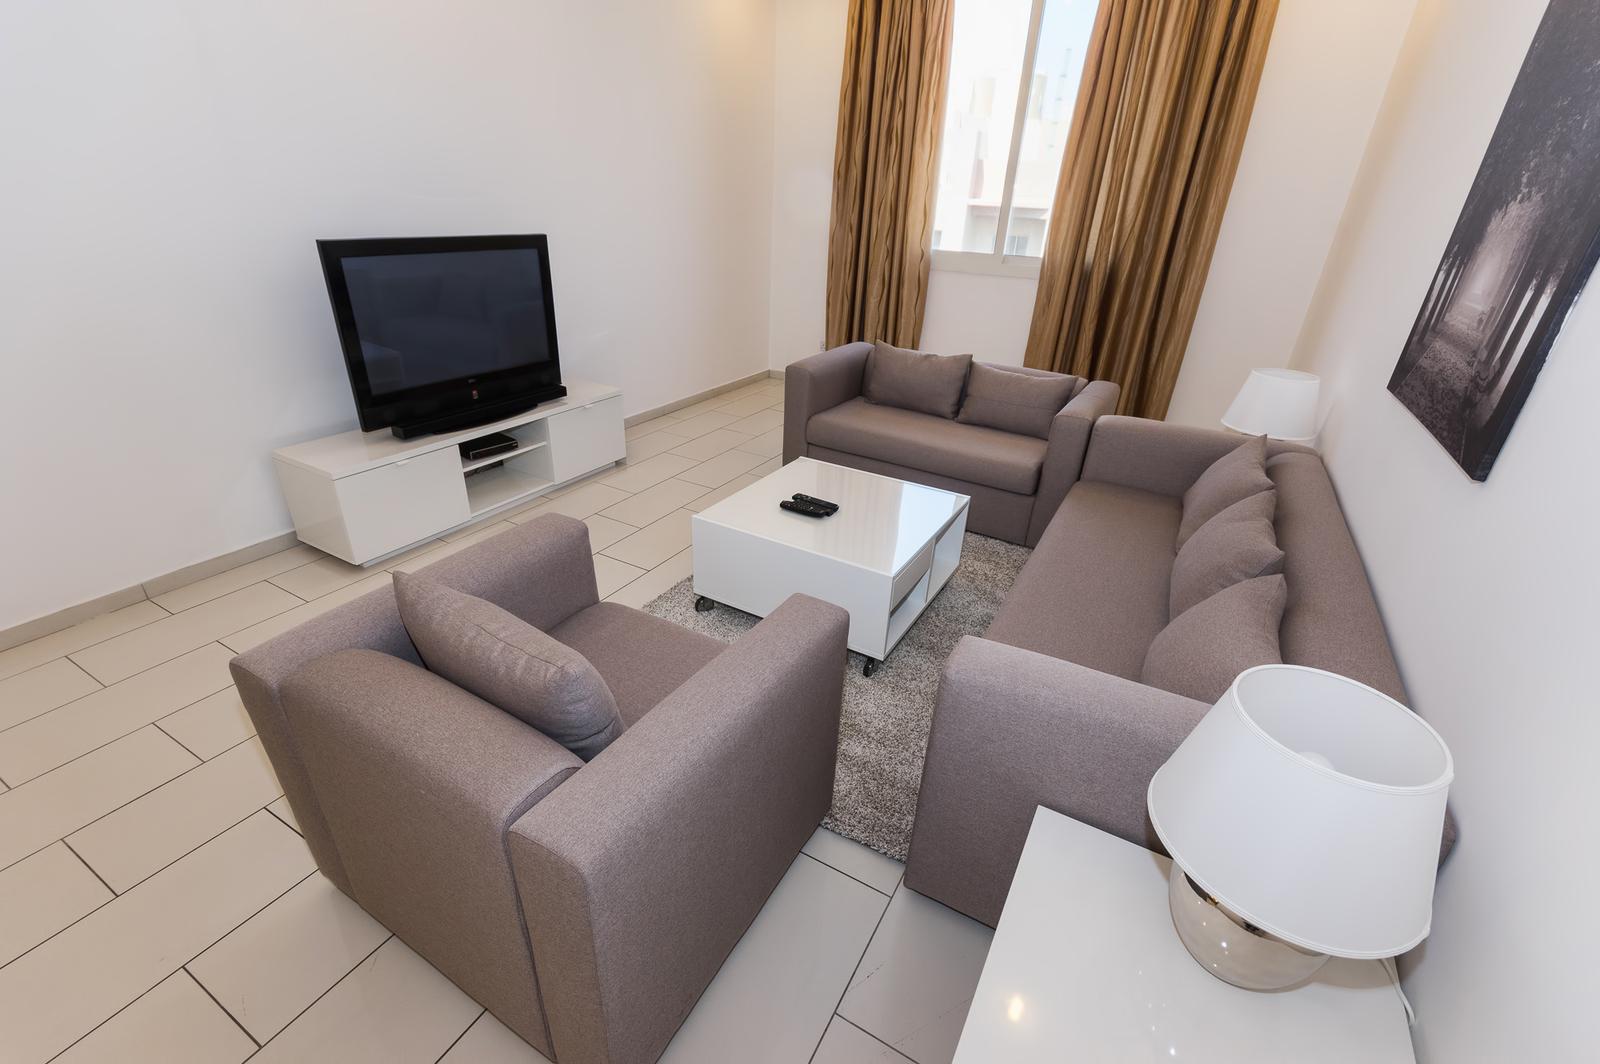 Salmiya – great, spacious, furnished three bedroom apartment